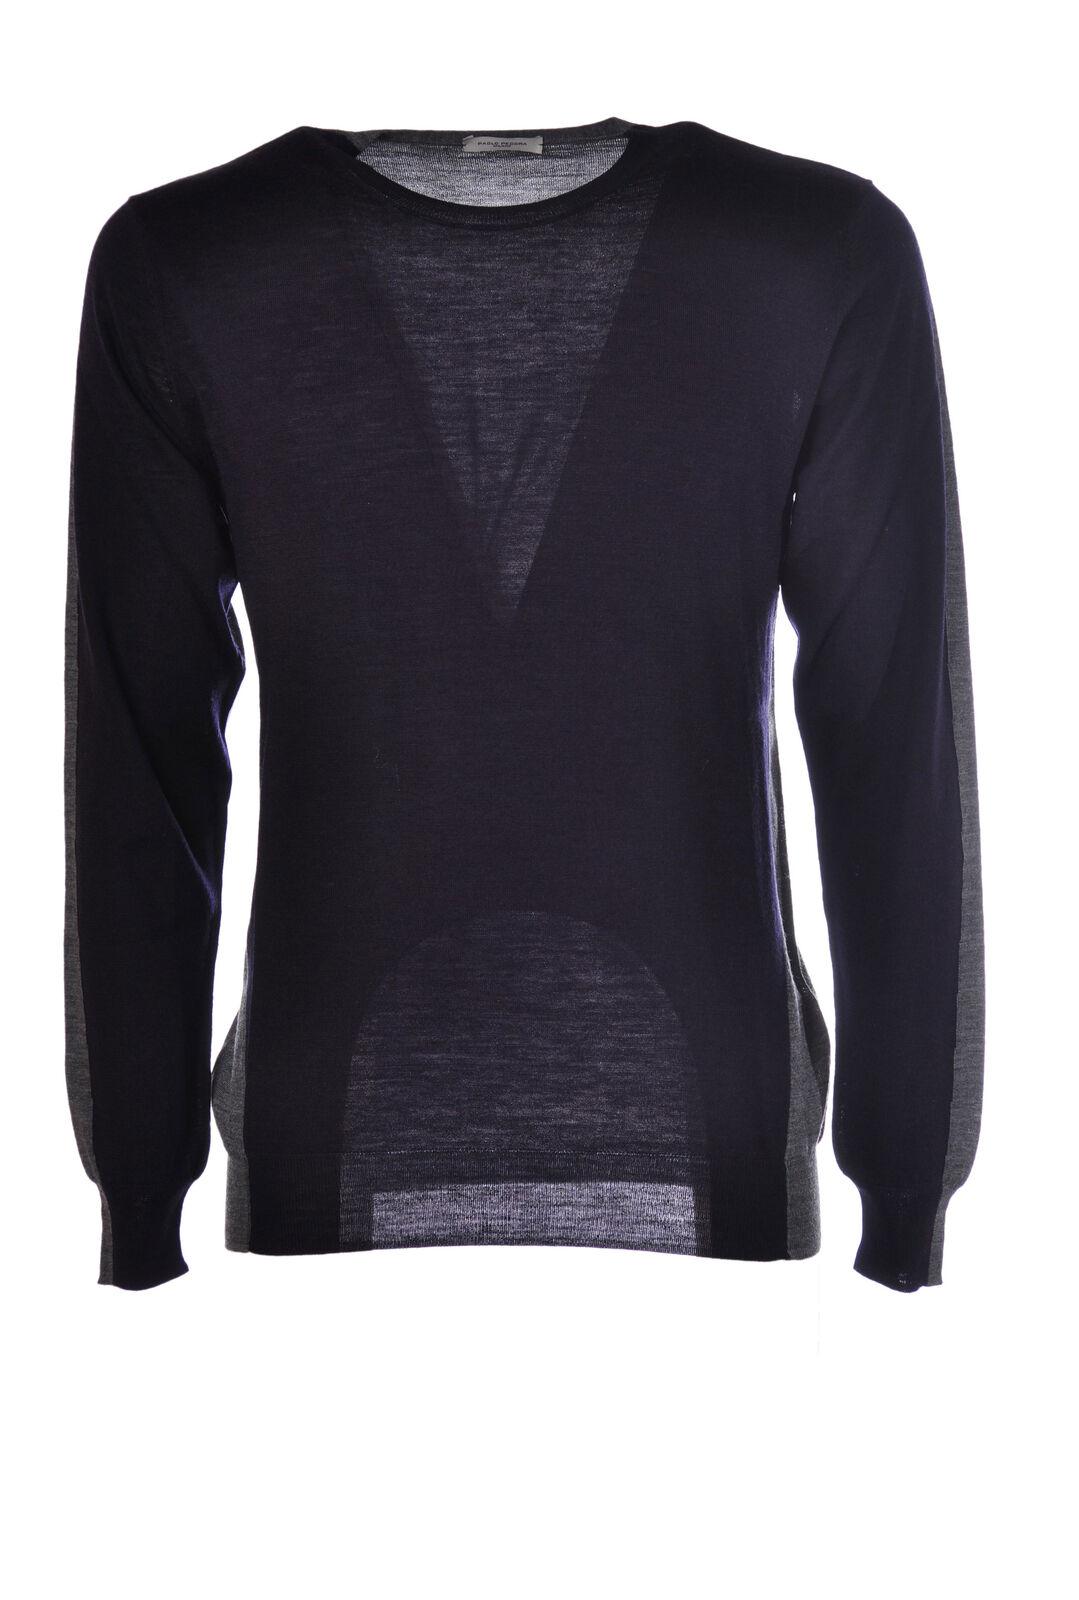 Paolo Pecora  -  Sweaters - Male - Blau - 2778030N173821